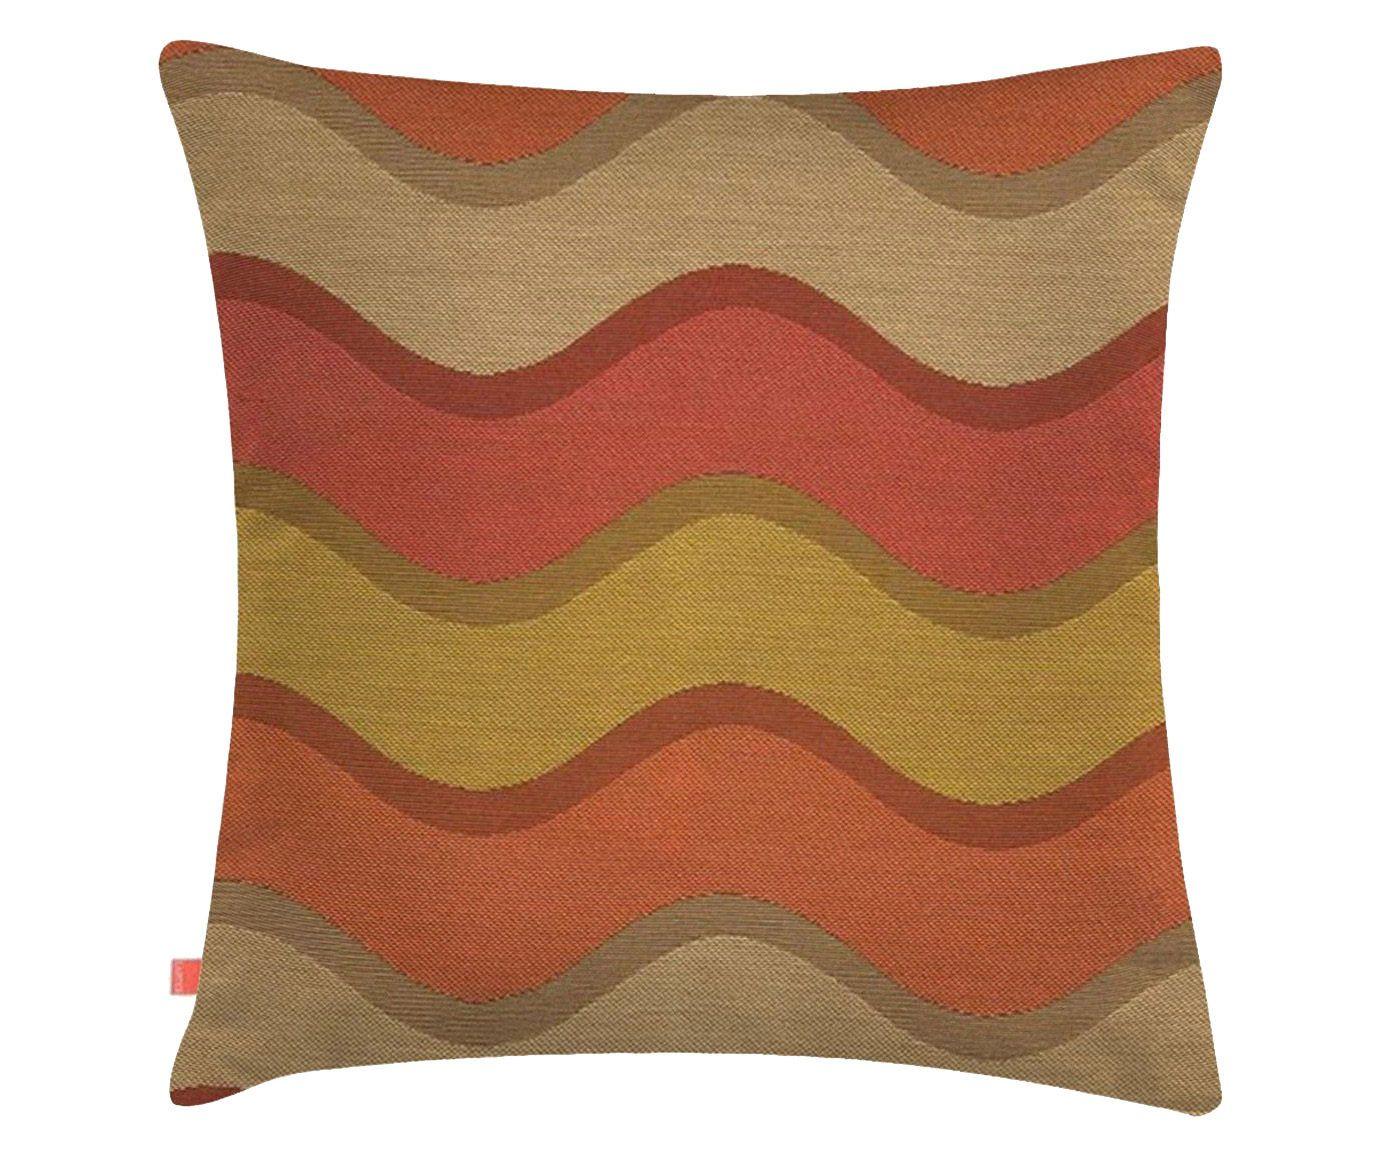 Capa para almofada colorfux waves - 45x45cm | Westwing.com.br